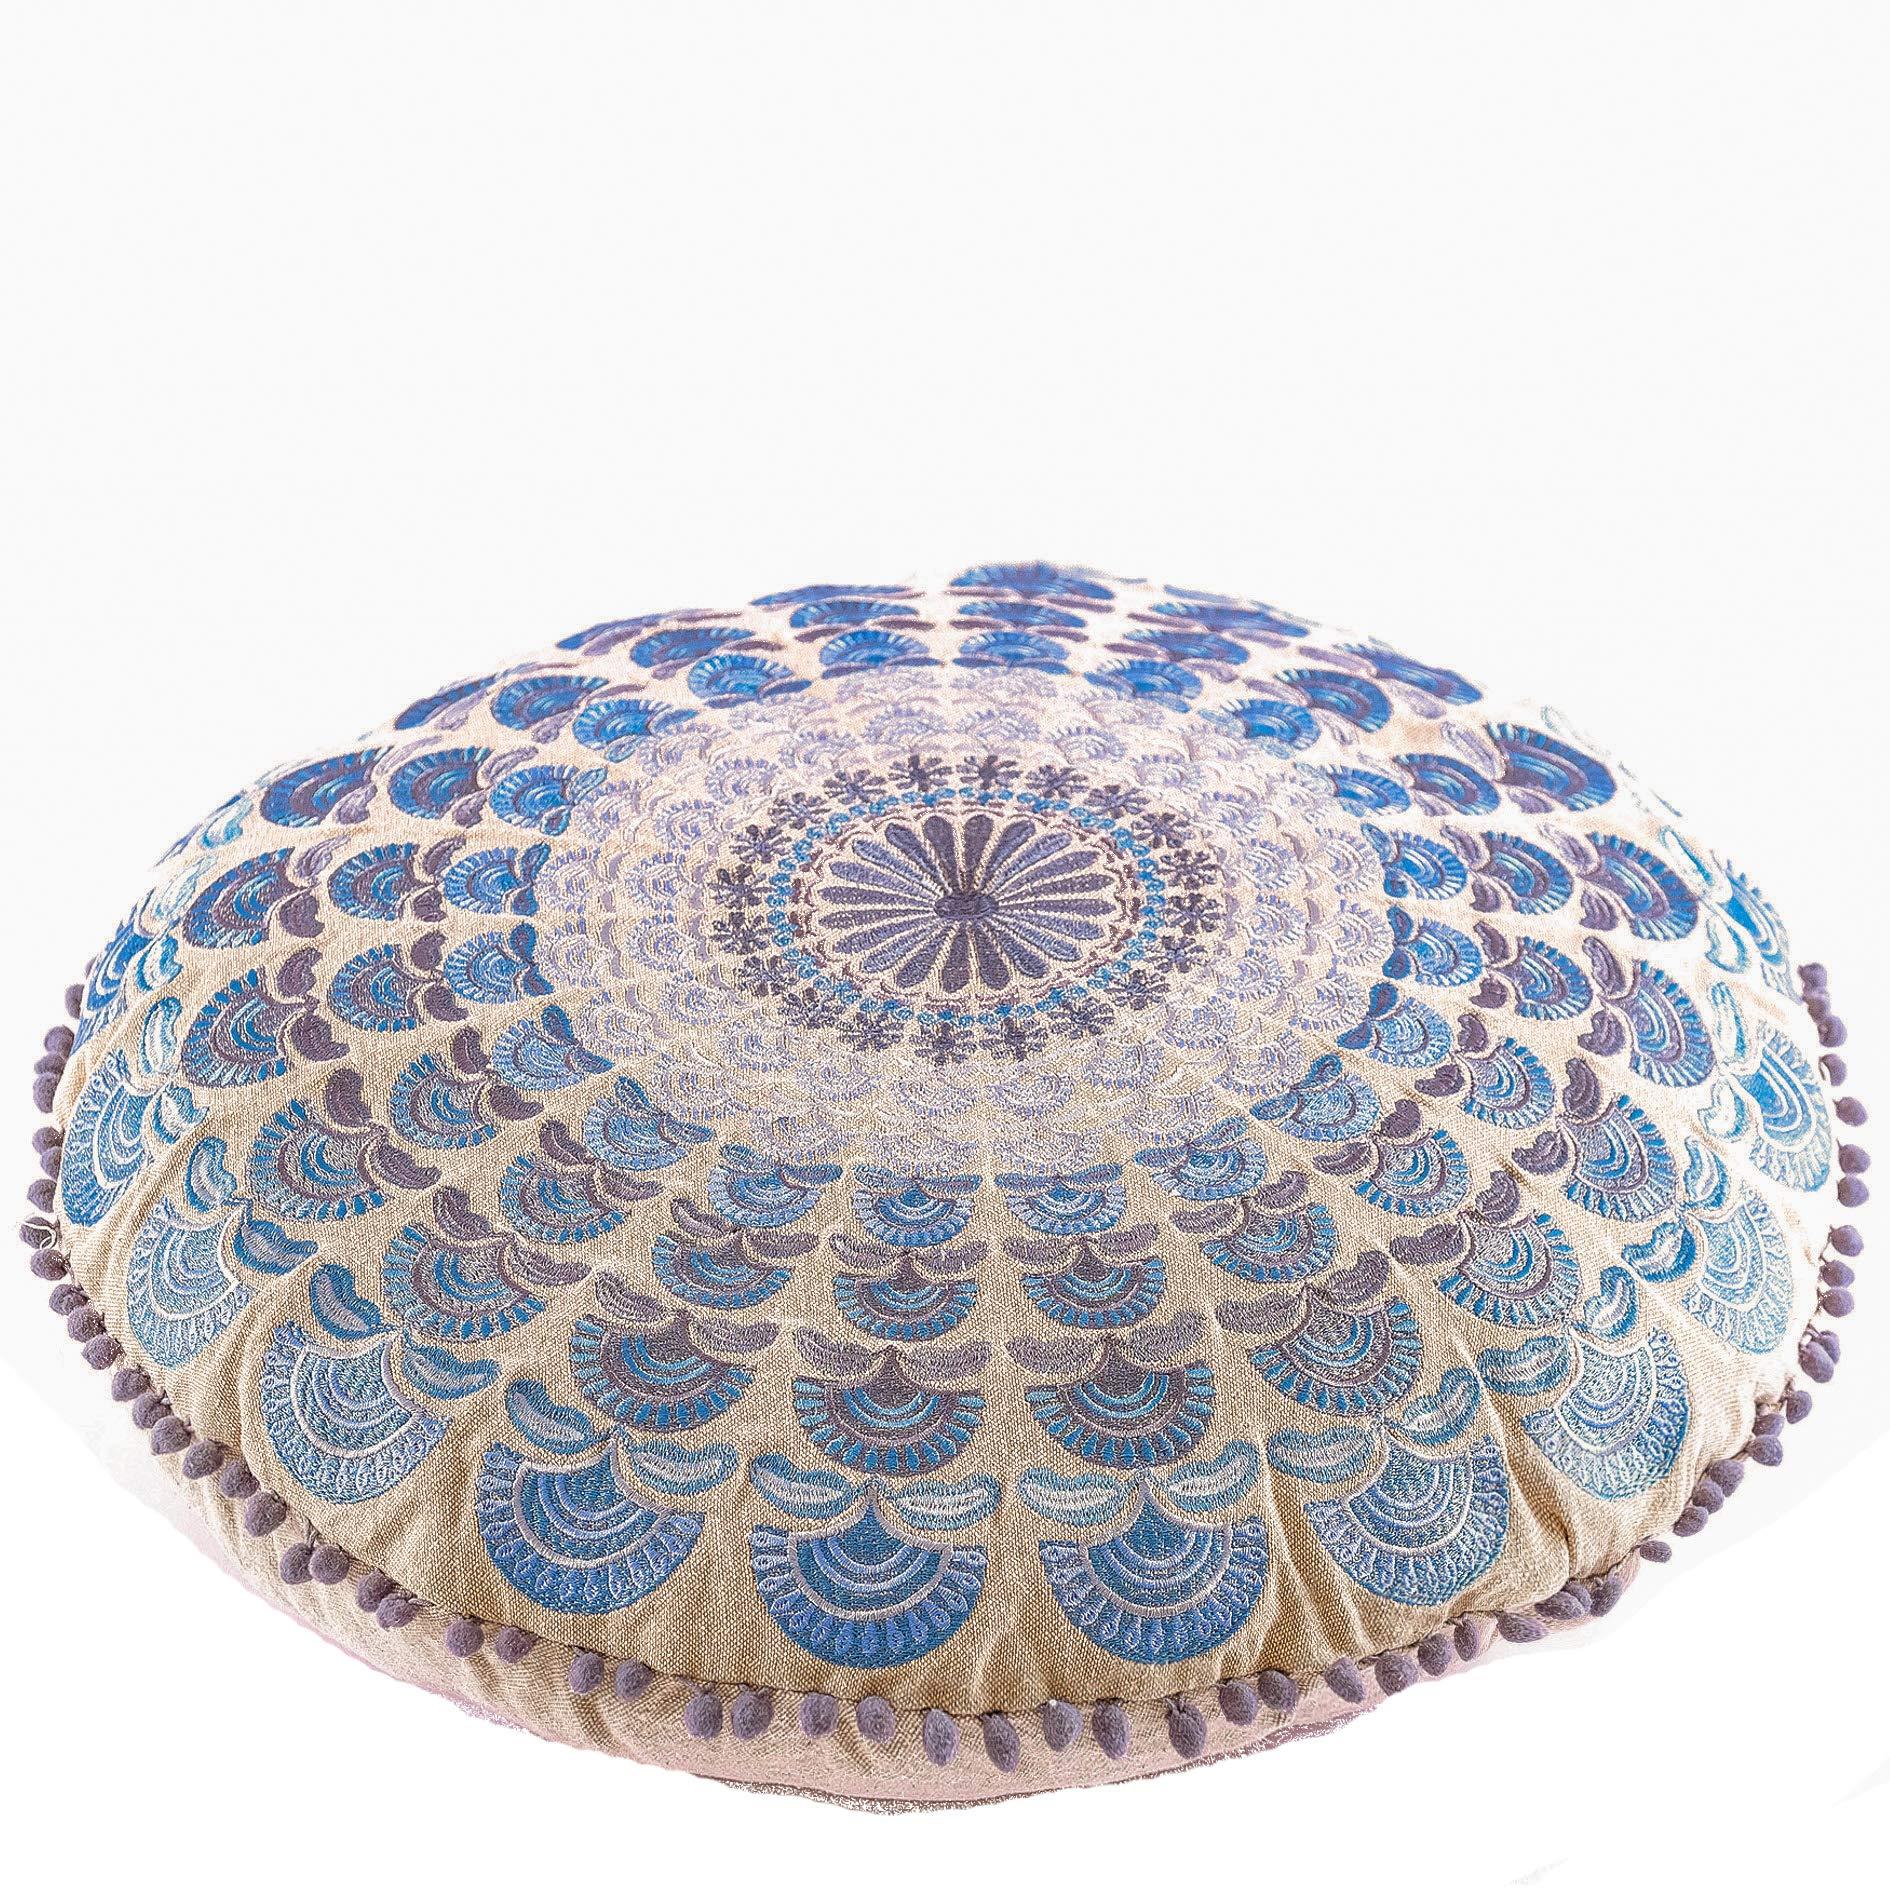 Mandala Life ART Peacock Pouf (Cushion Stuffed 24'', Blue Embroidery)